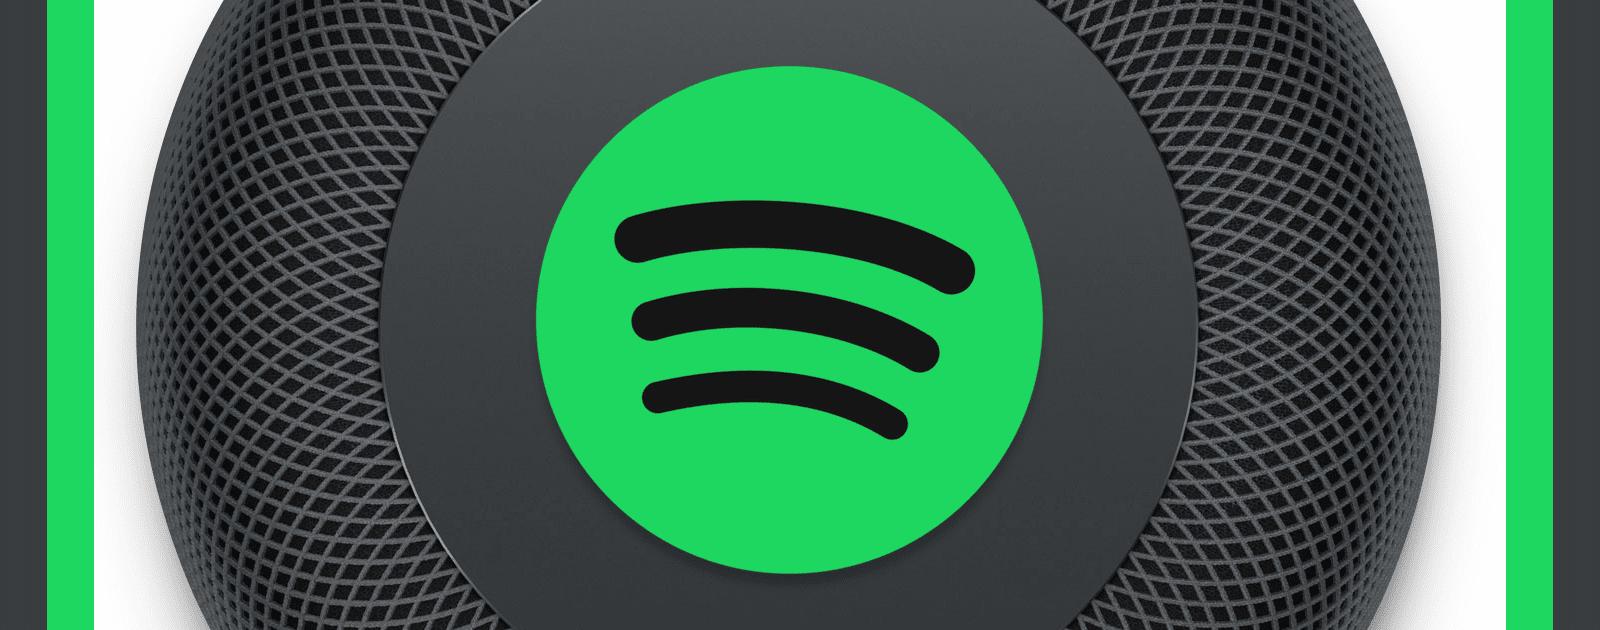 Homepod Spotify